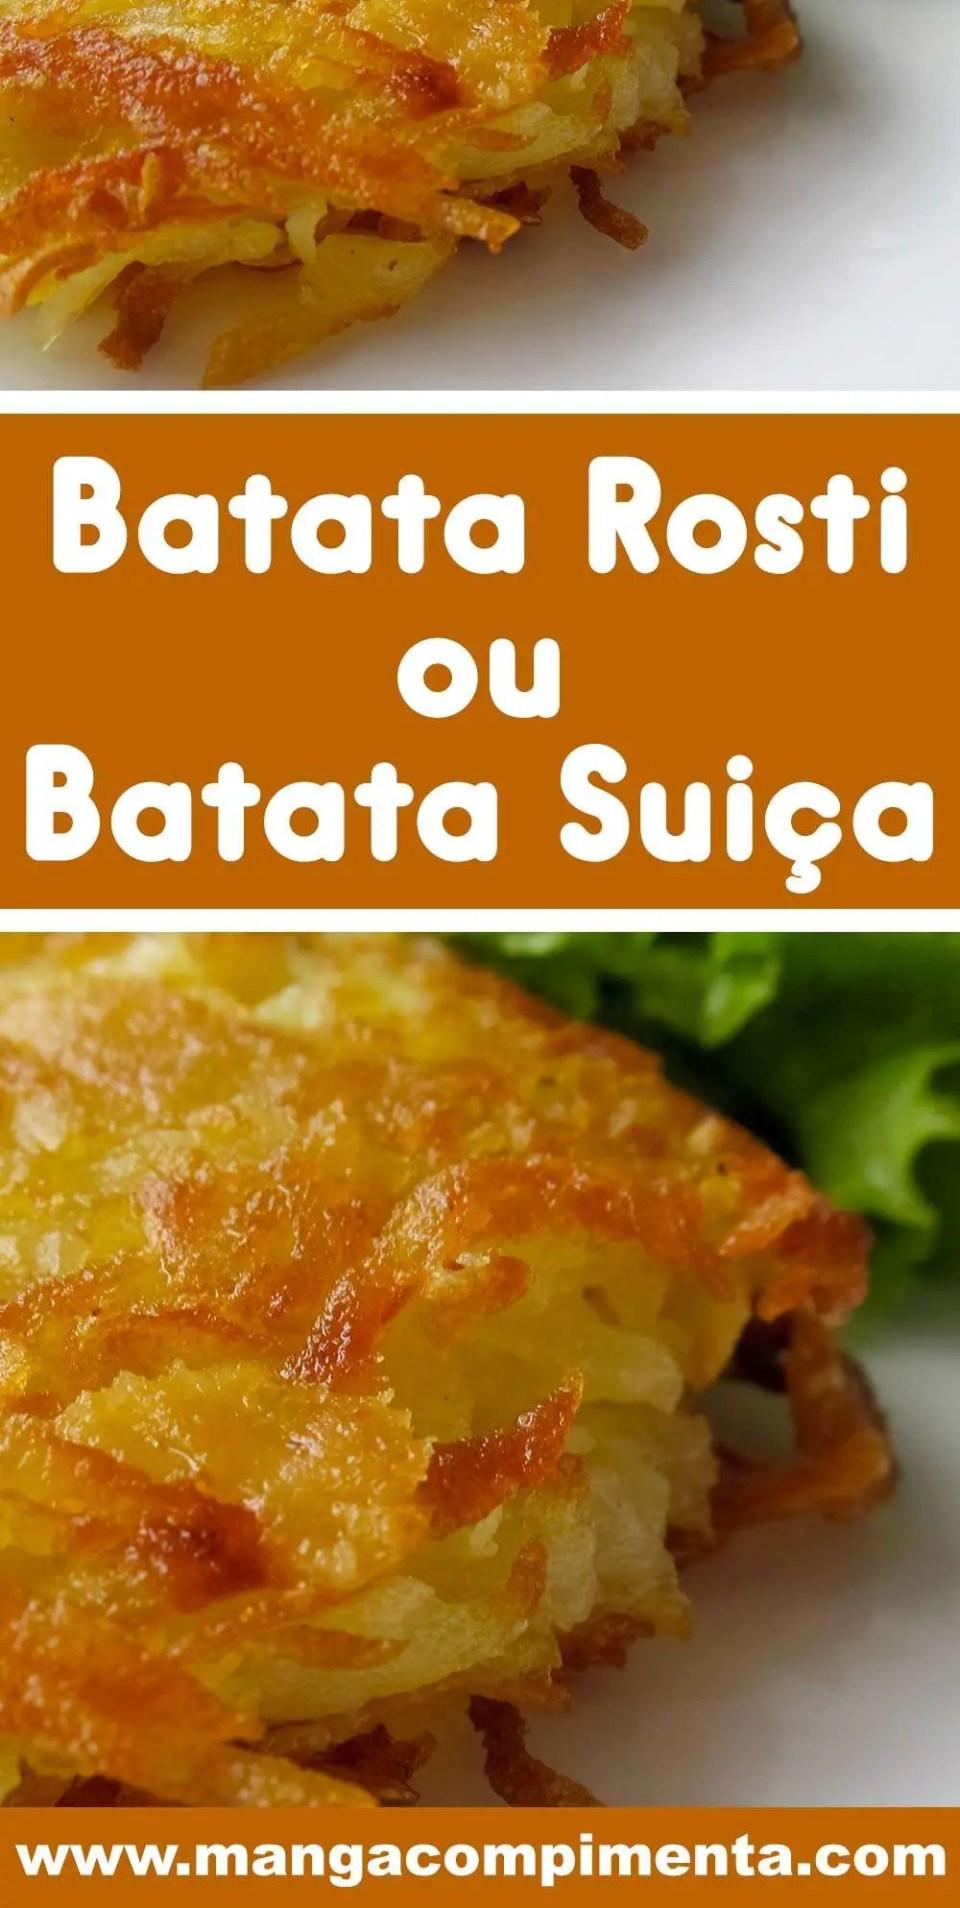 Batata Rostiou Batata Suíça - um prato delicioso para lanchar ou almoçar.